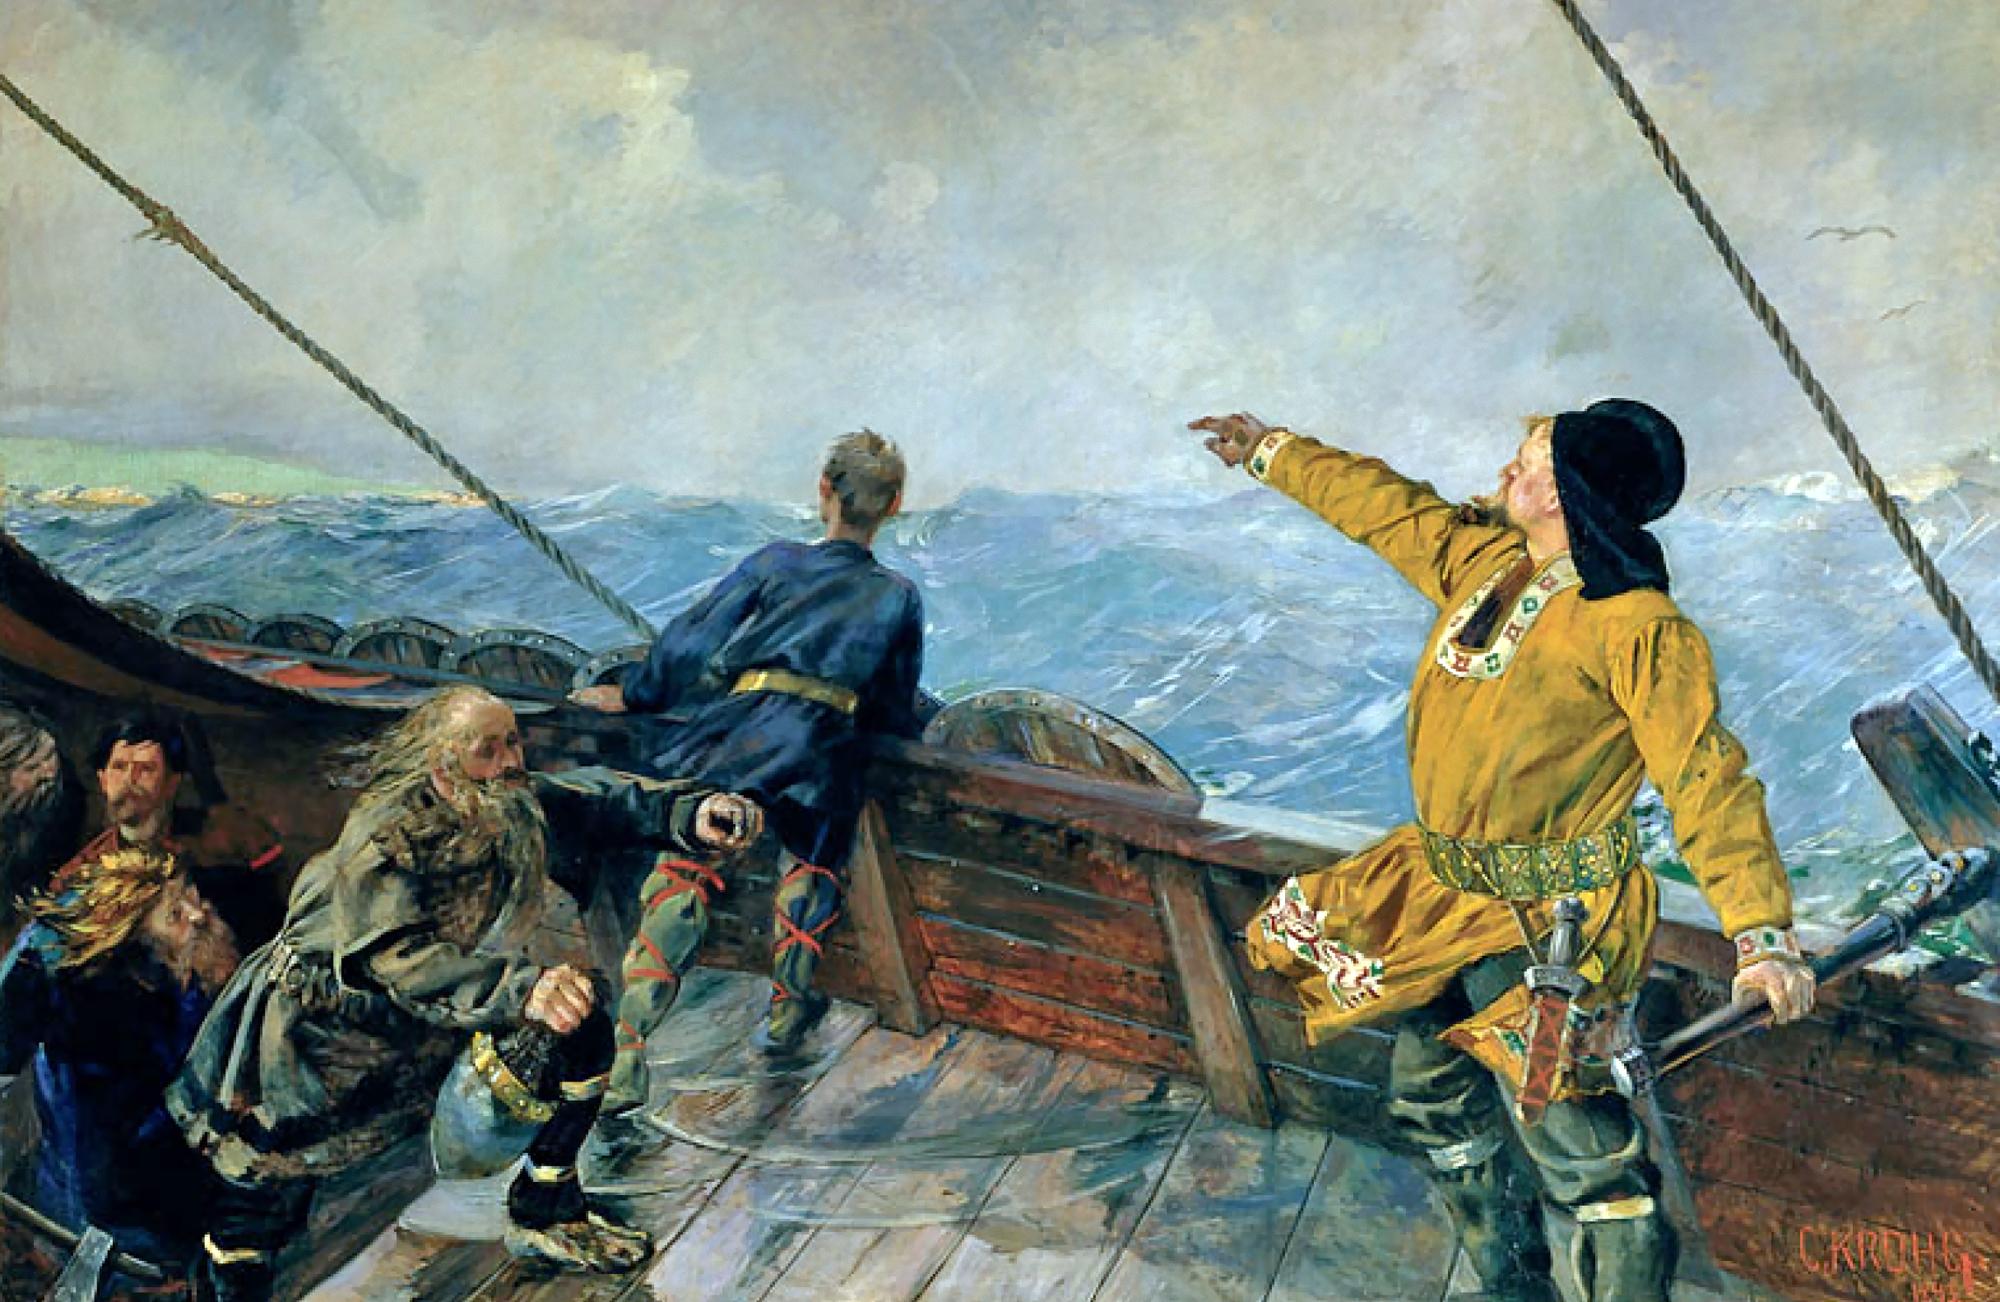 Leiv Eiriksson Discovers America by Christian Krohg (1893)